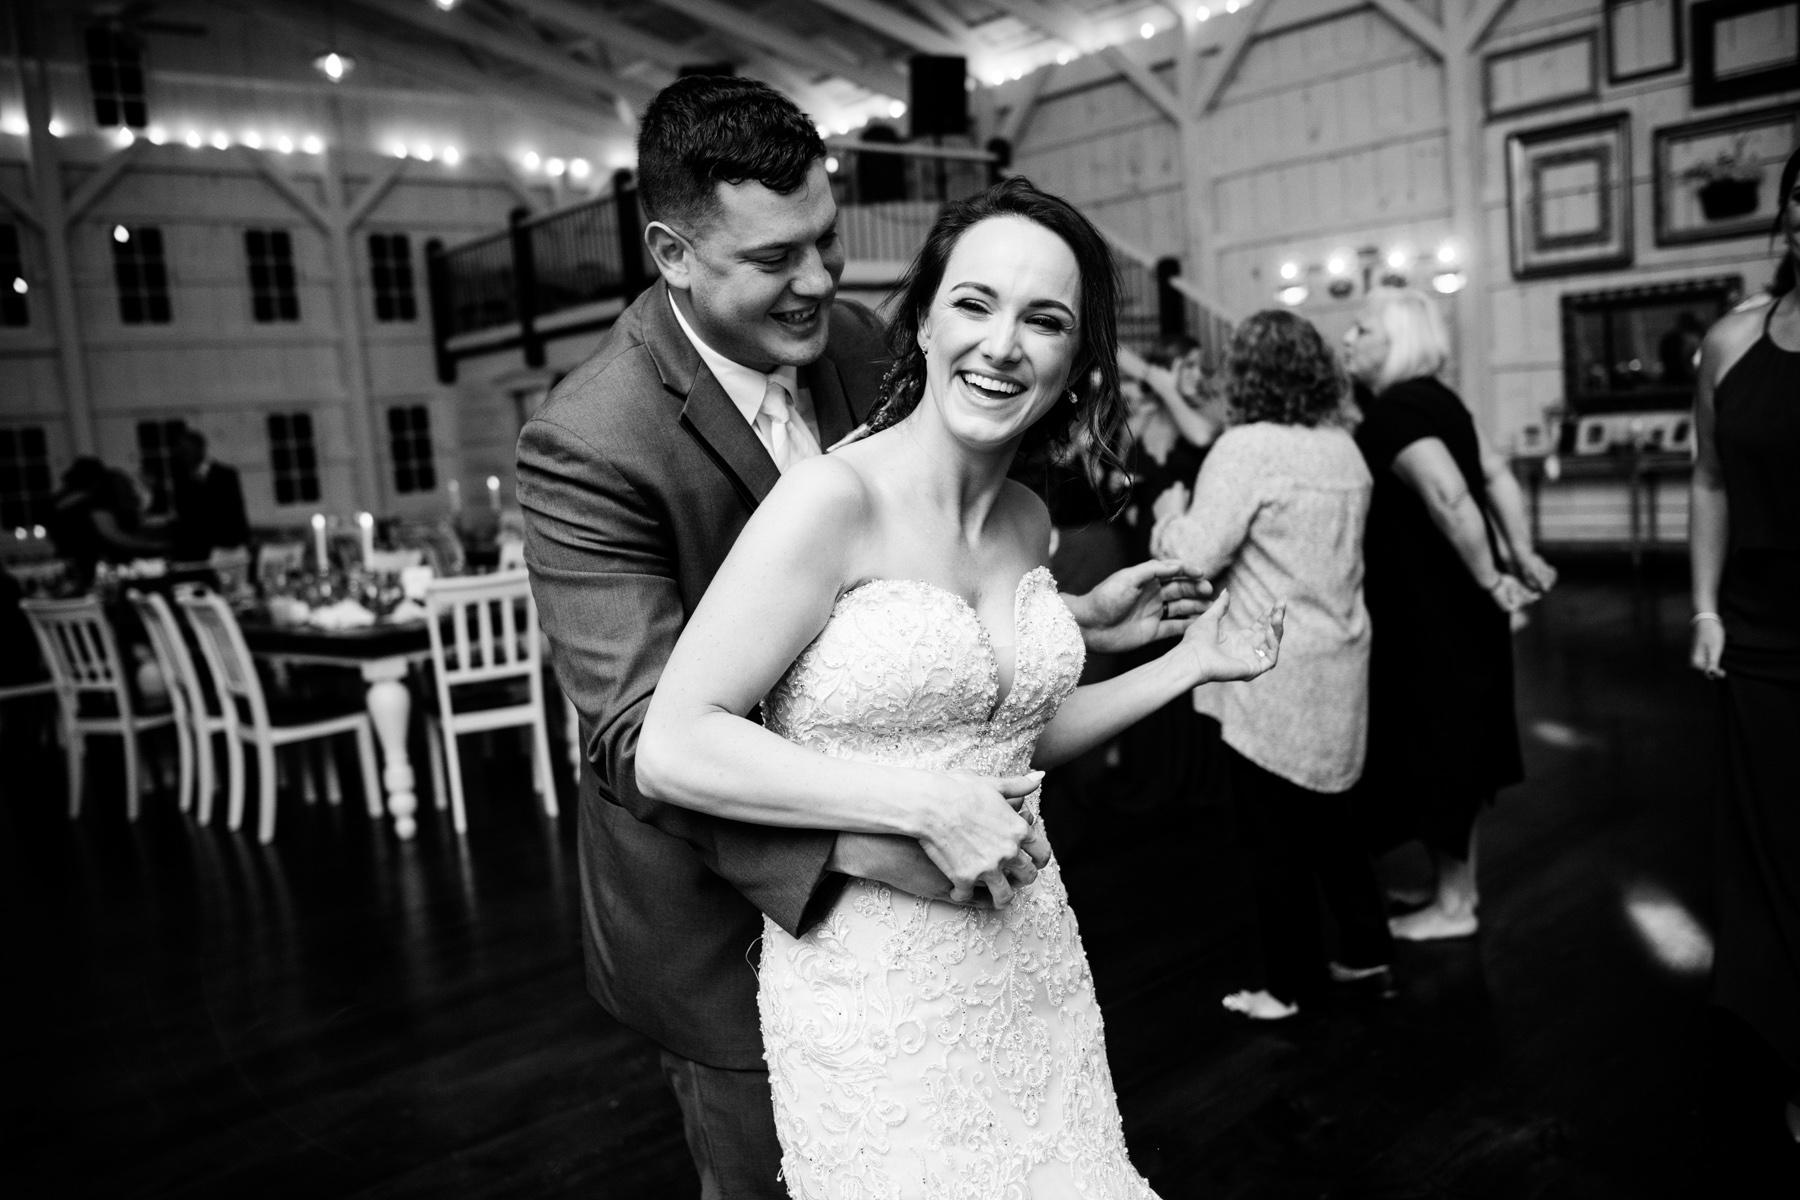 groom dances with bride